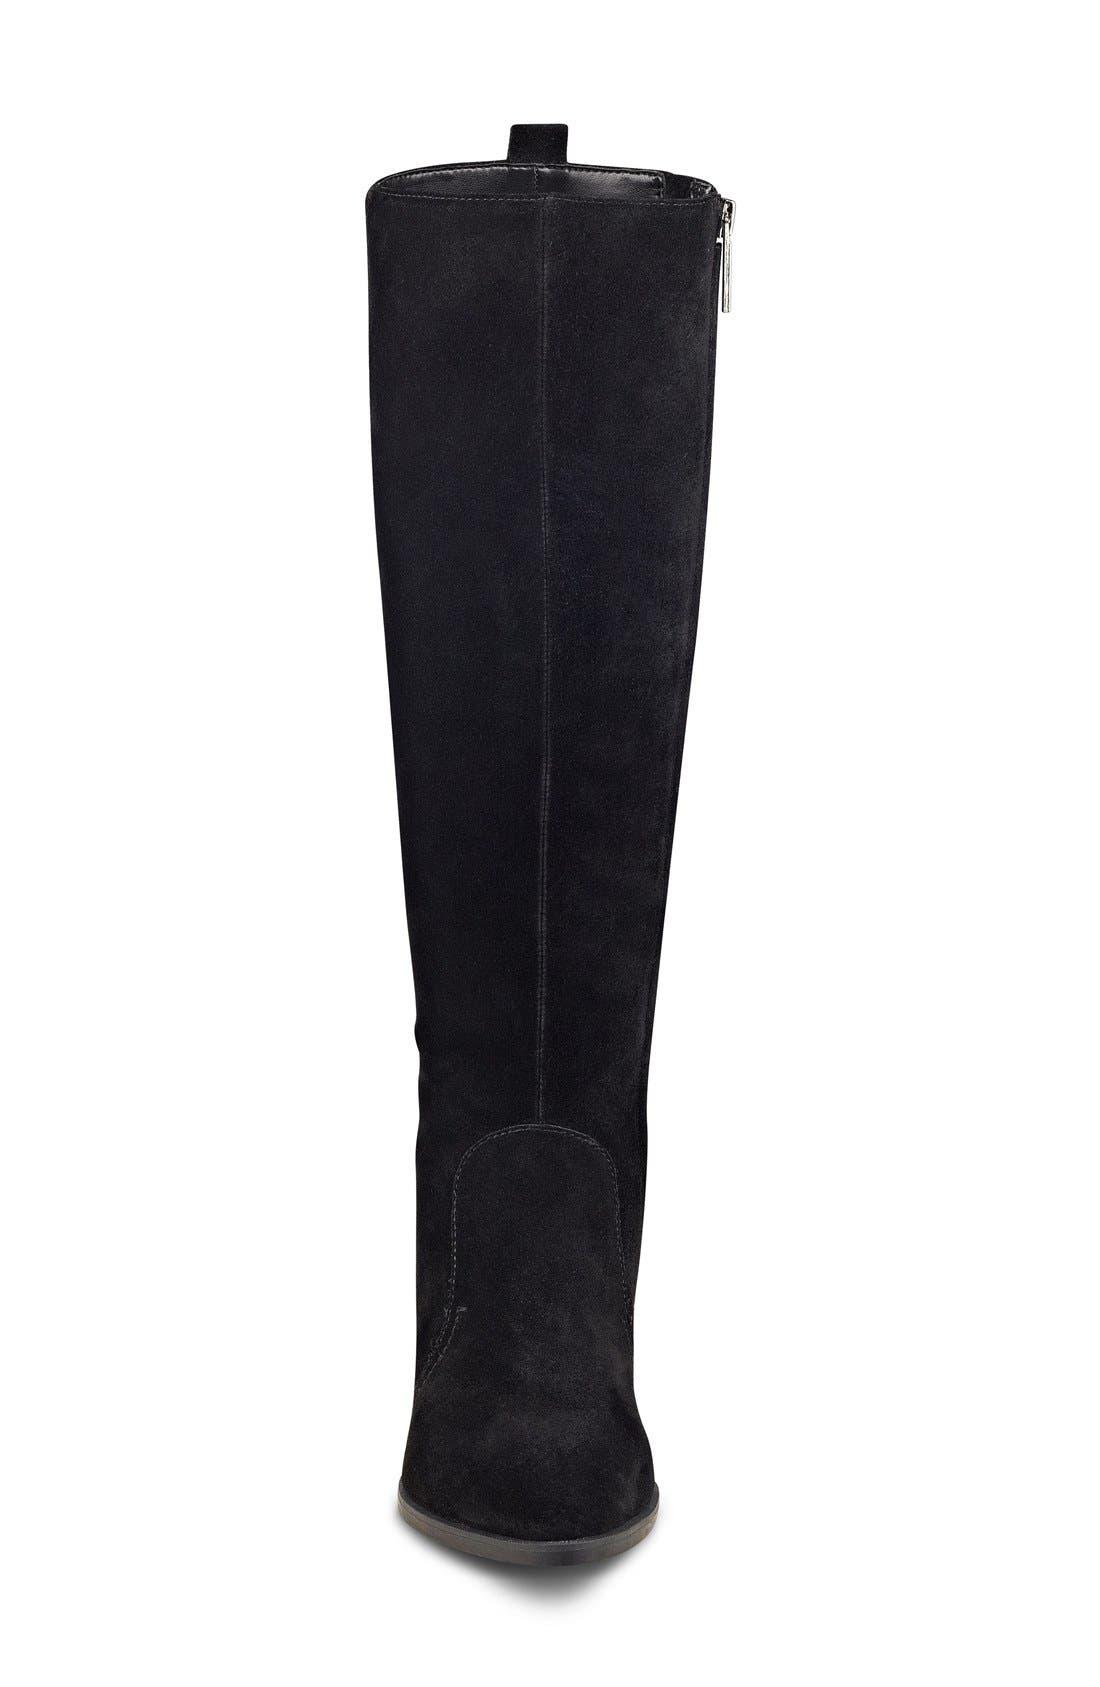 NINE WEST,                             'Nicolah' Tall Boot,                             Alternate thumbnail 3, color,                             001